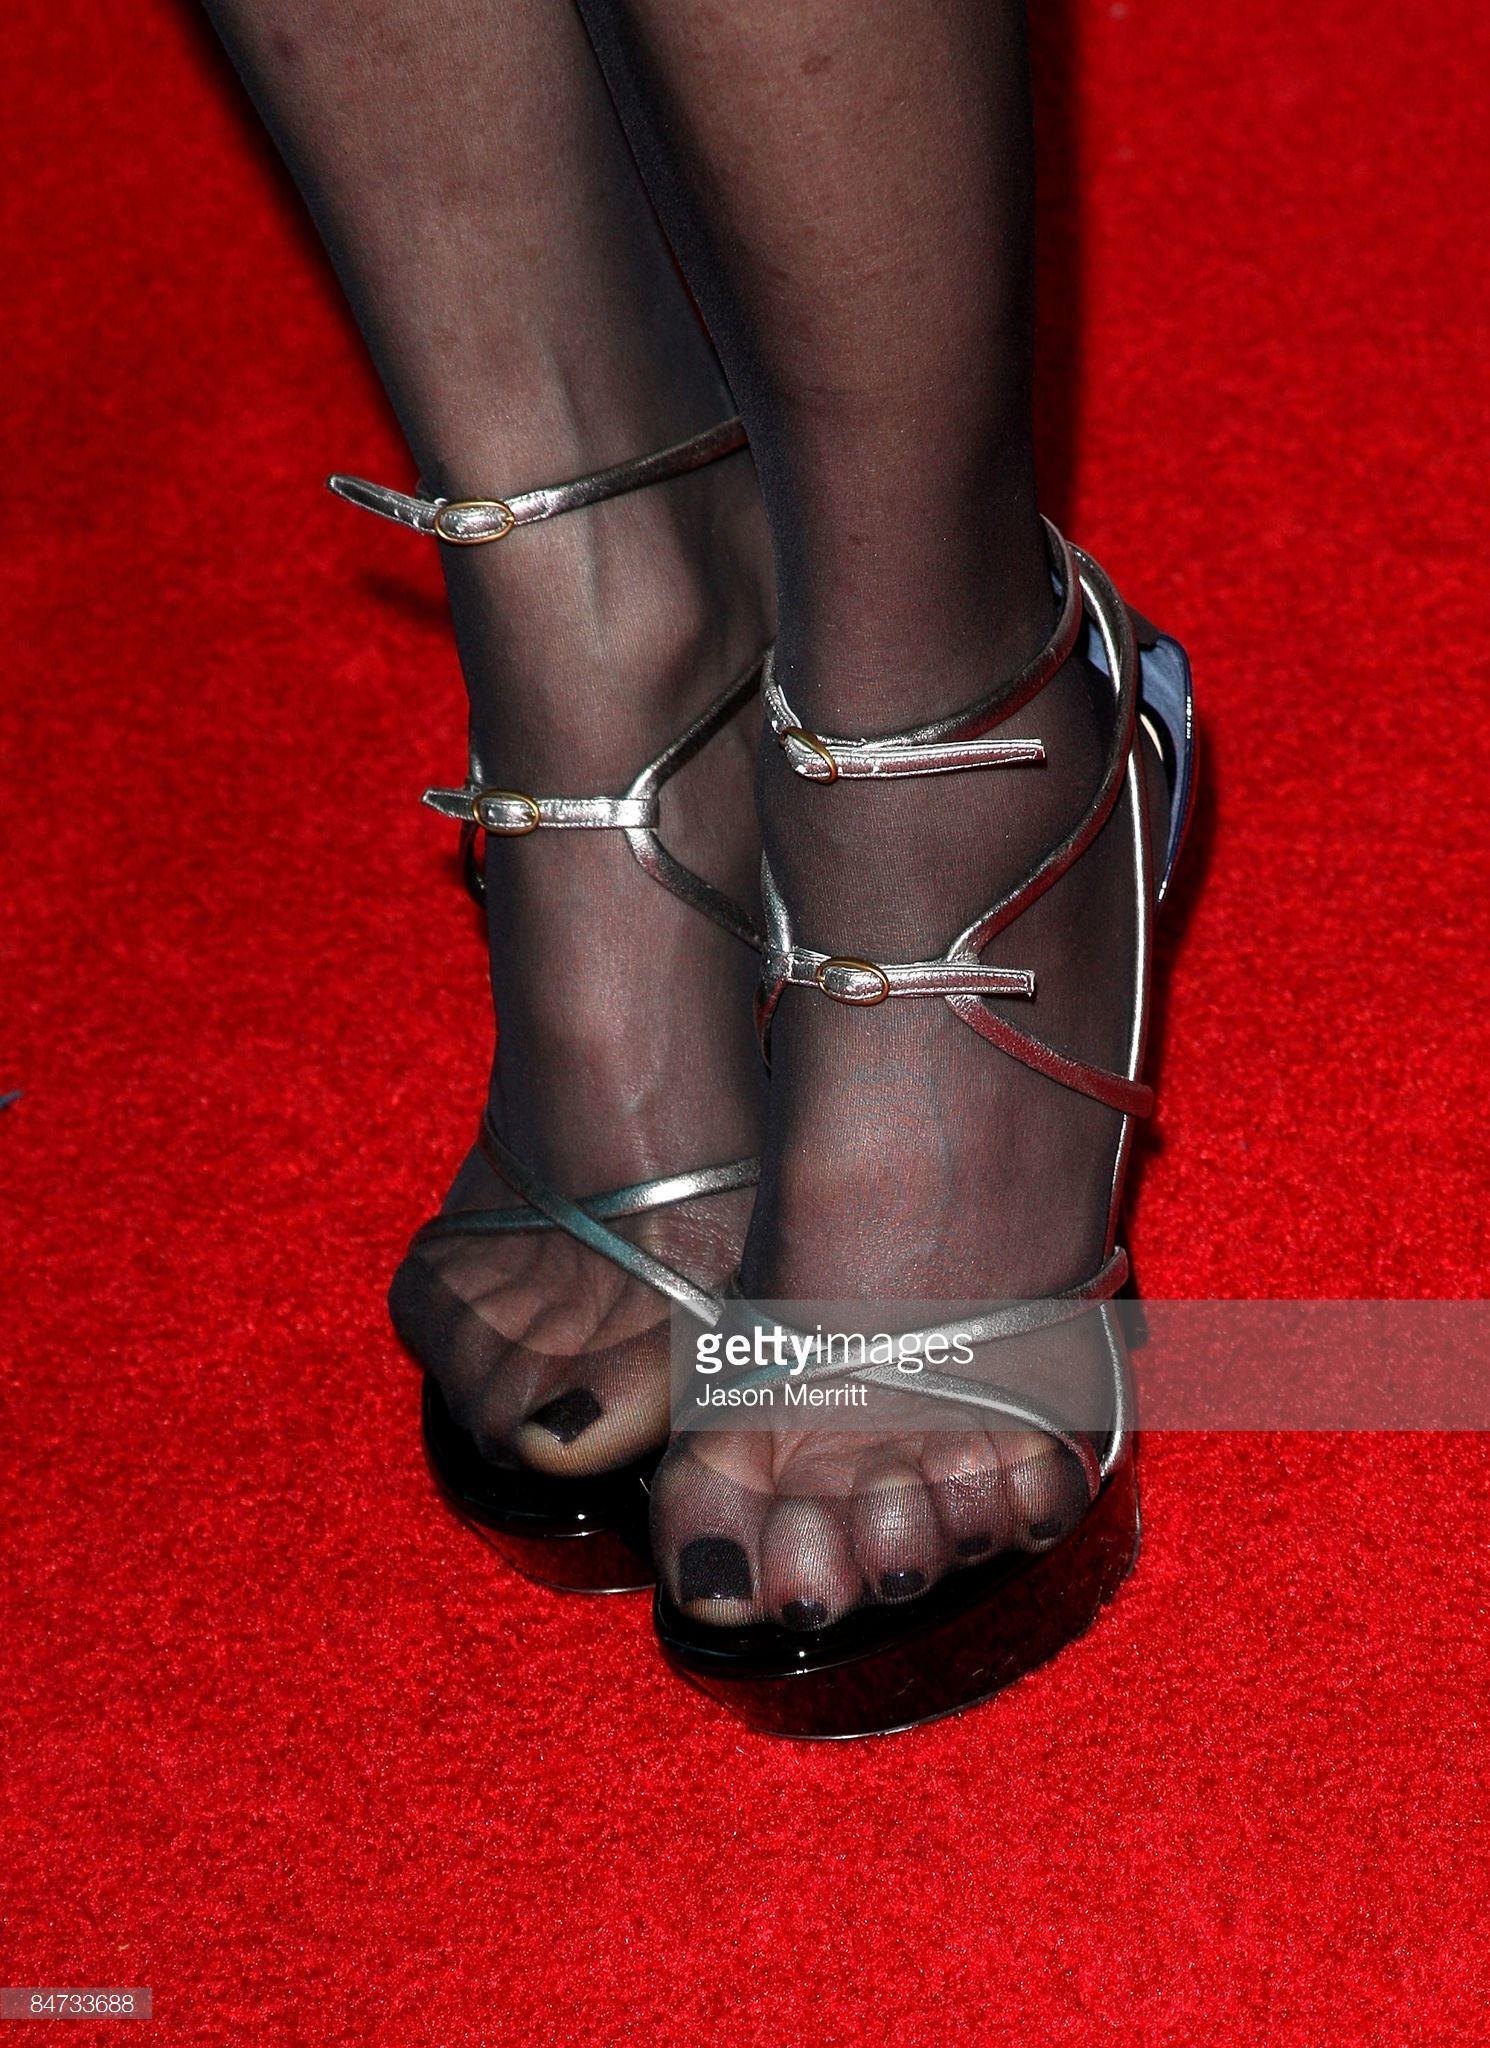 Kate Capshaws Feet-4885